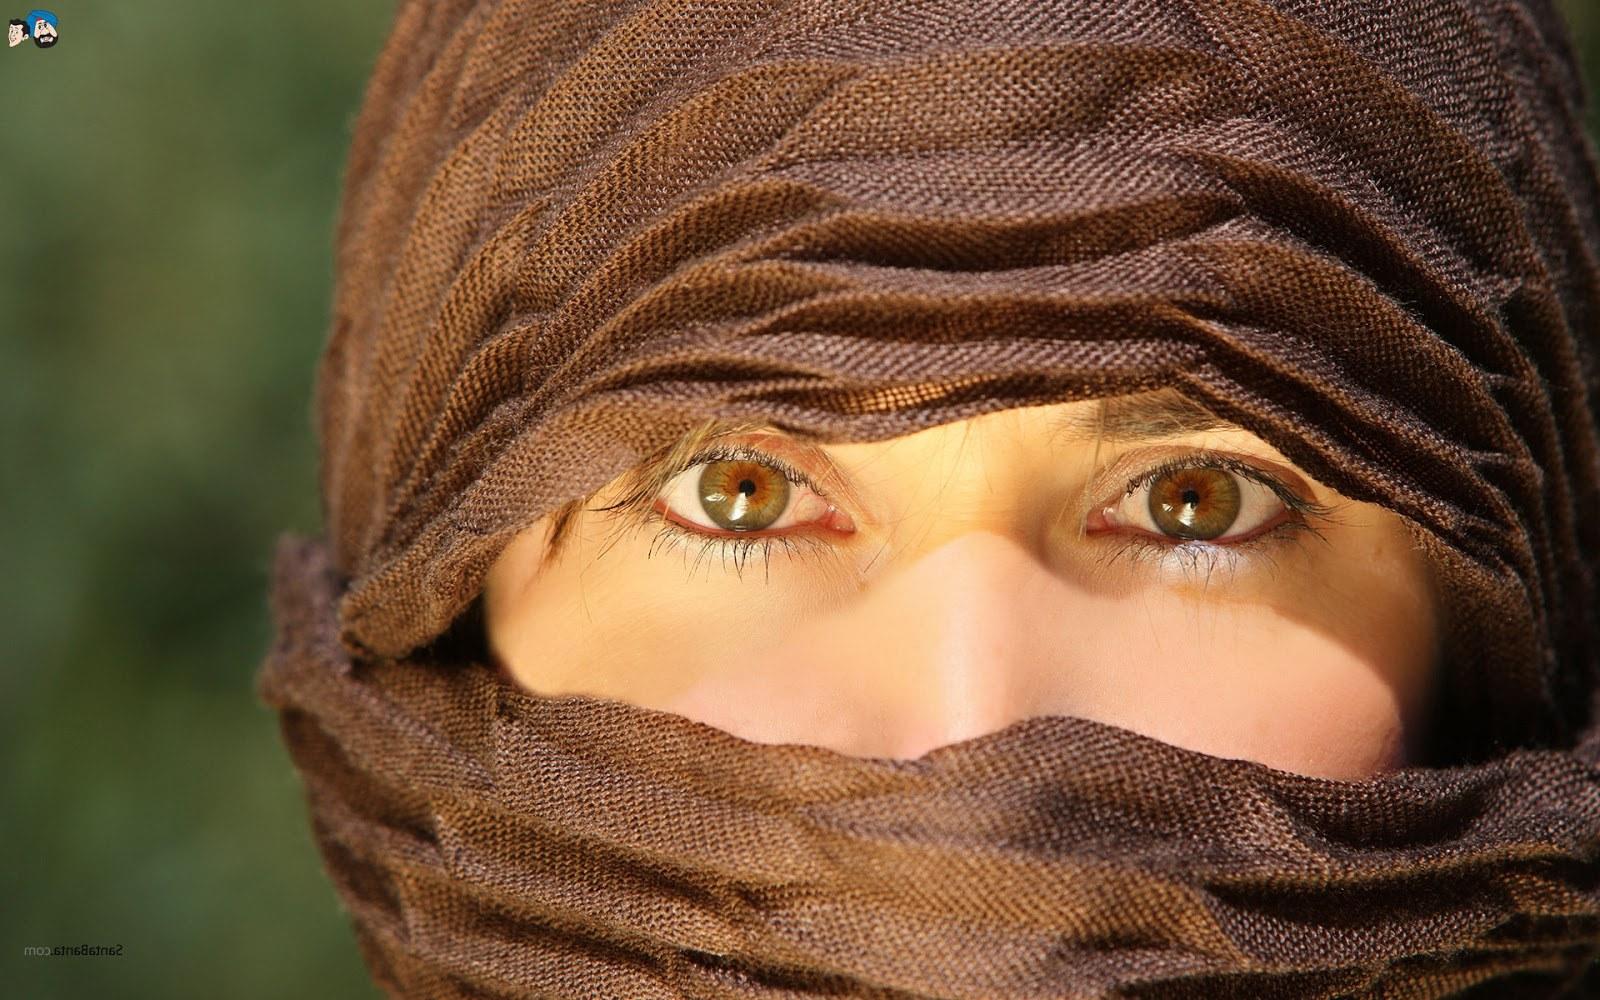 Design Muslimah Bercadar Cantik 0gdr Koleksi Wallpaper Wanita Muslimah Bercadar